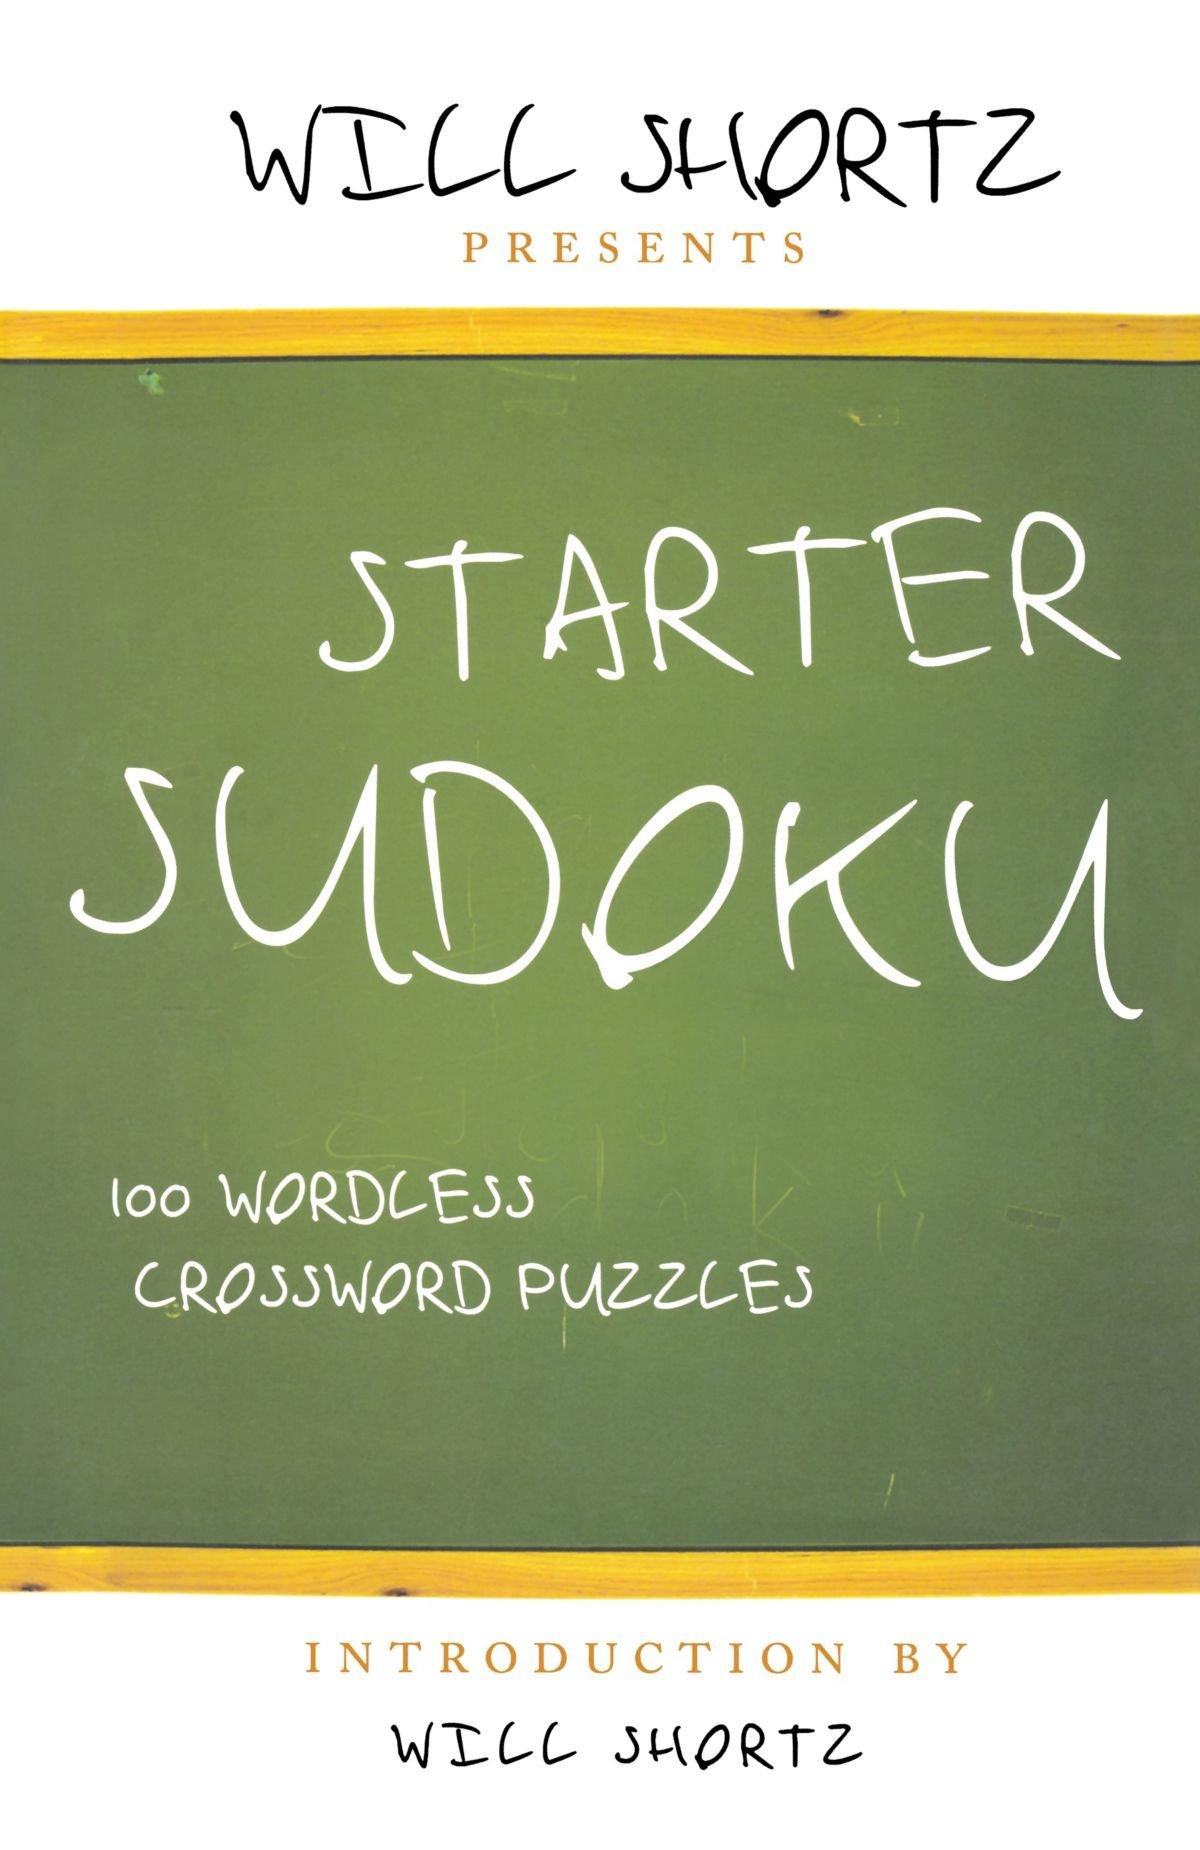 Will Shortz Presents Starter Sudoku: 100 Wordless Crossword Puzzles pdf